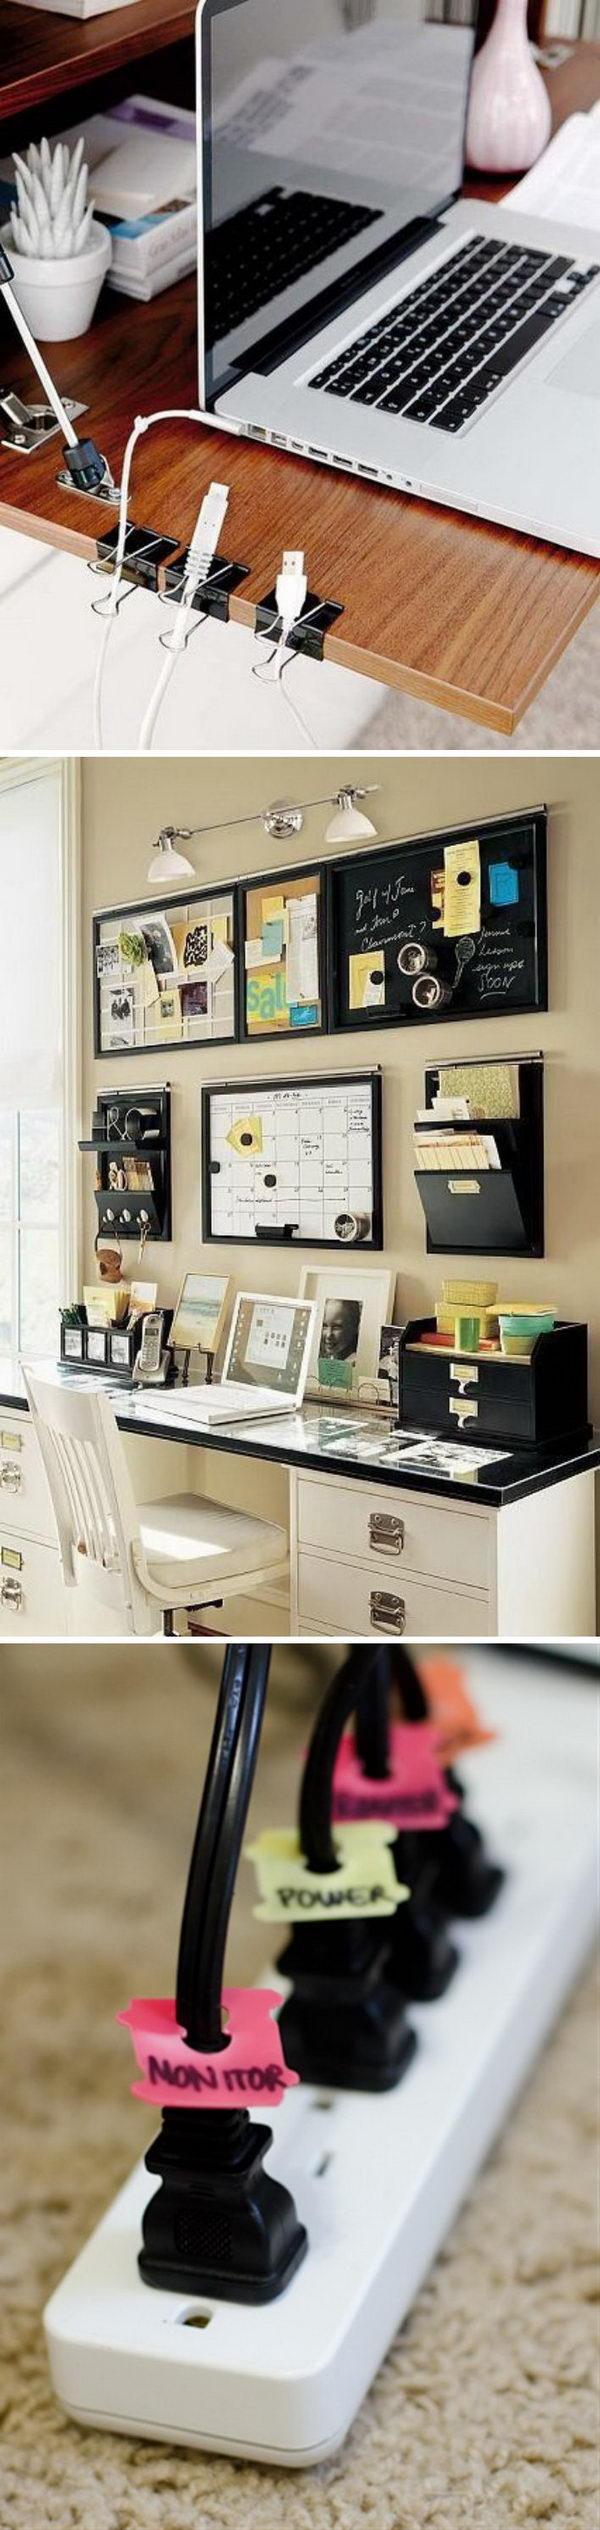 Effective Home Office Organization Ideas.